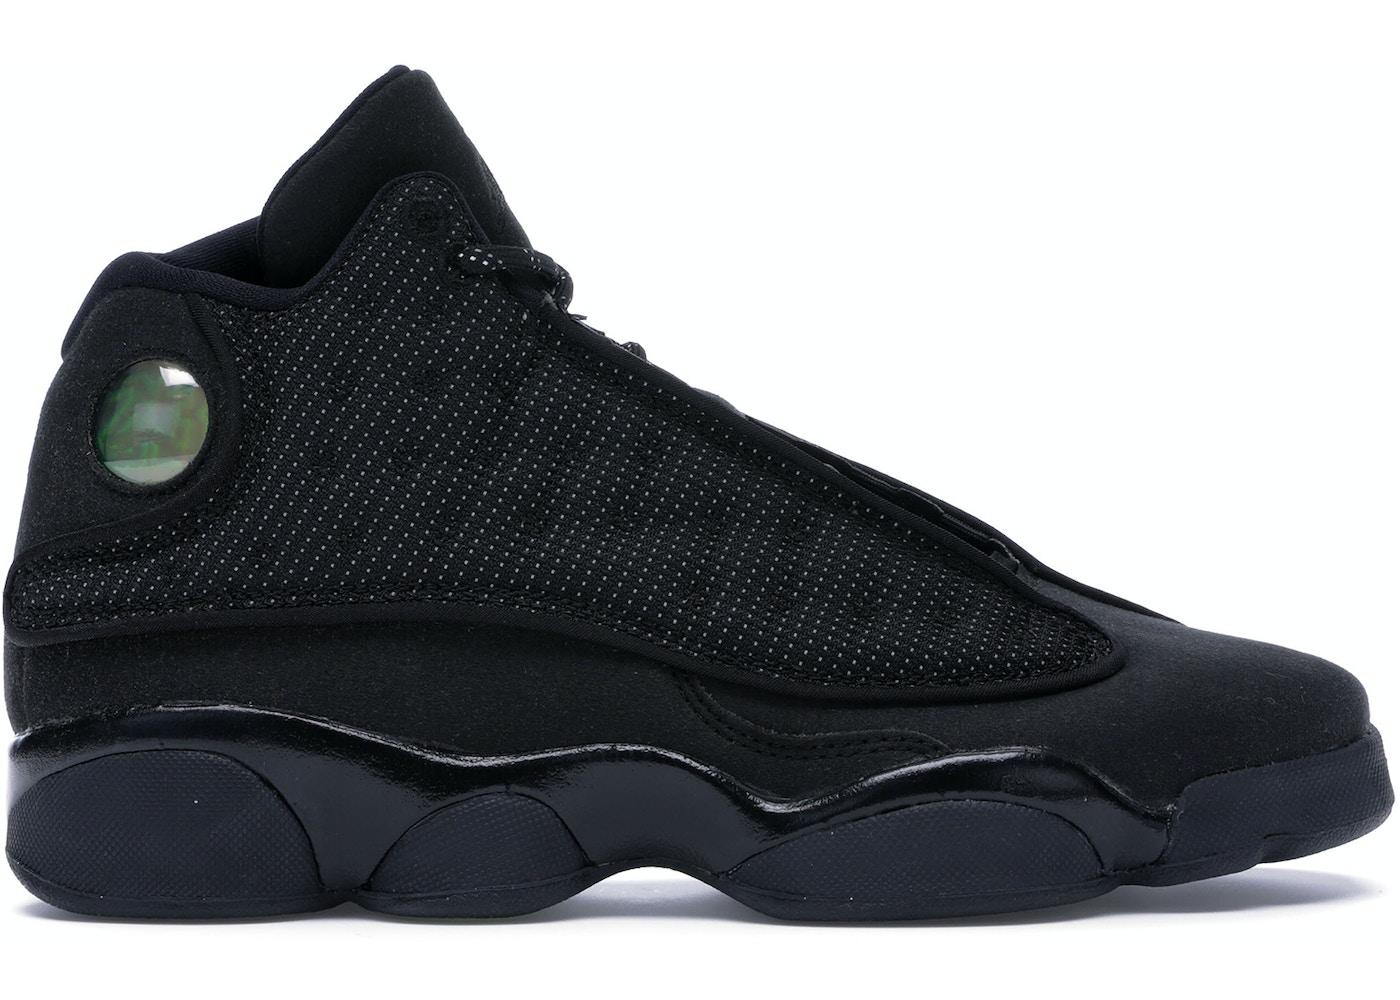 on sale 206a4 b360d Jordan 13 Retro Black Cat (GS) - 884129-011